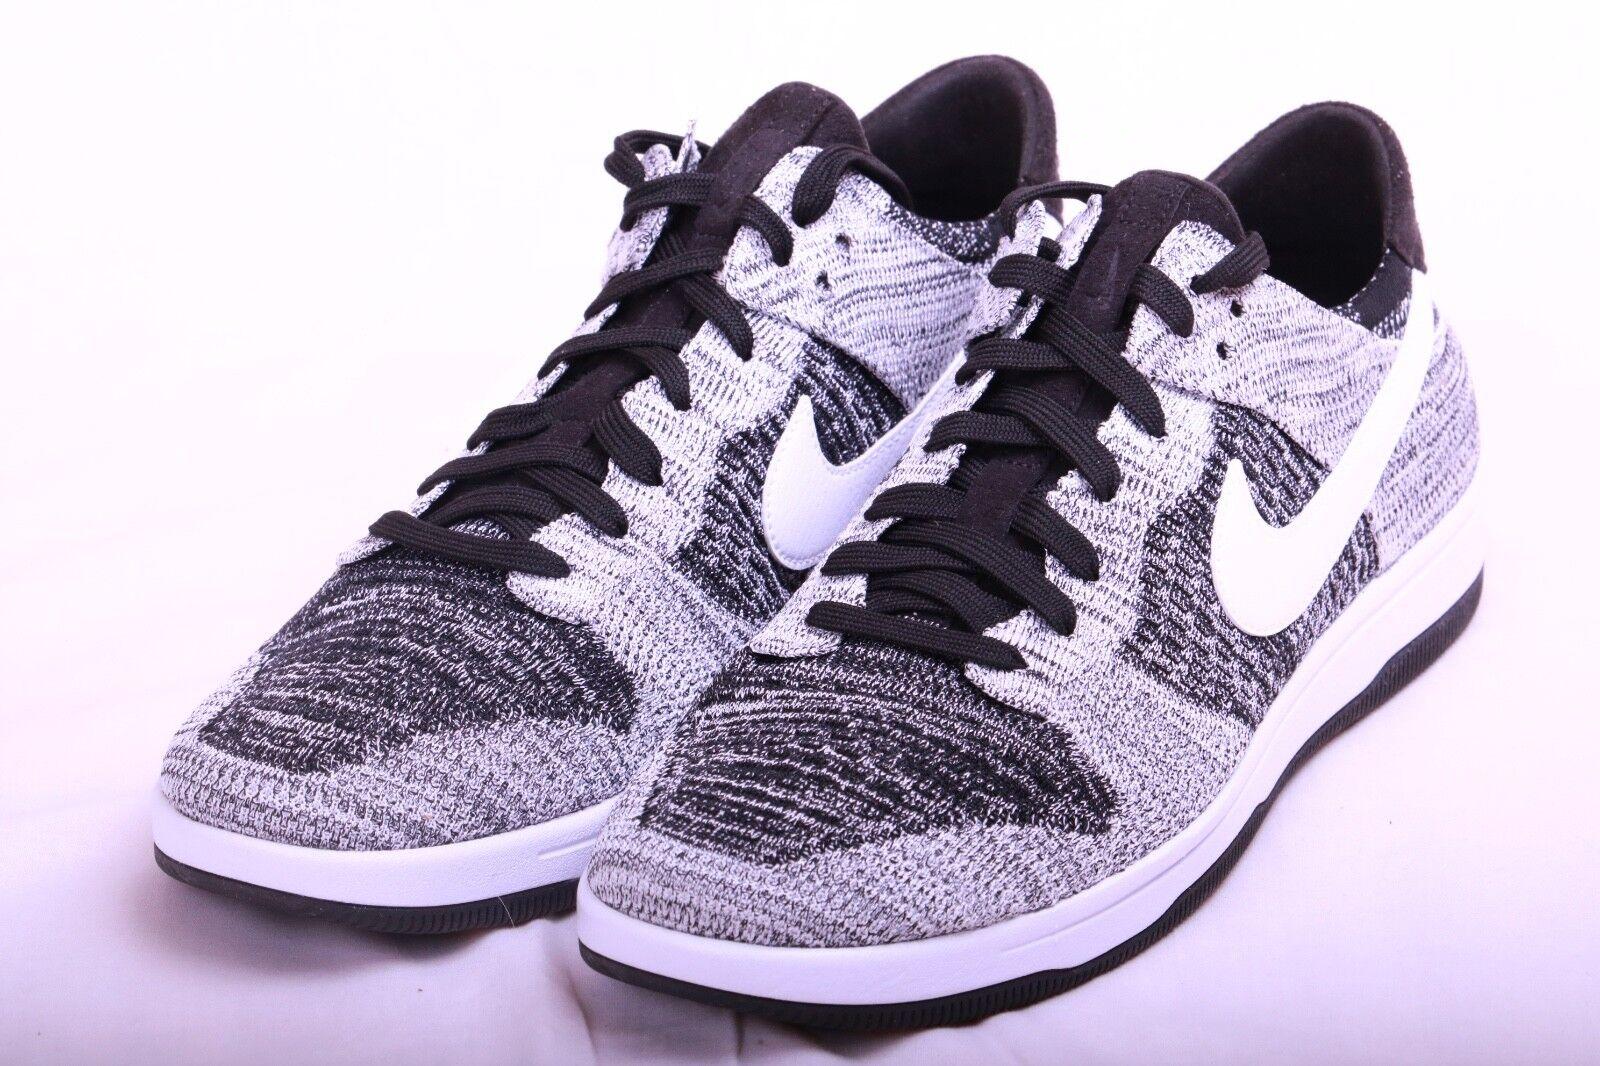 Nike Mens Dunk Flyknit Black White Oreo 917746 003 Size 13